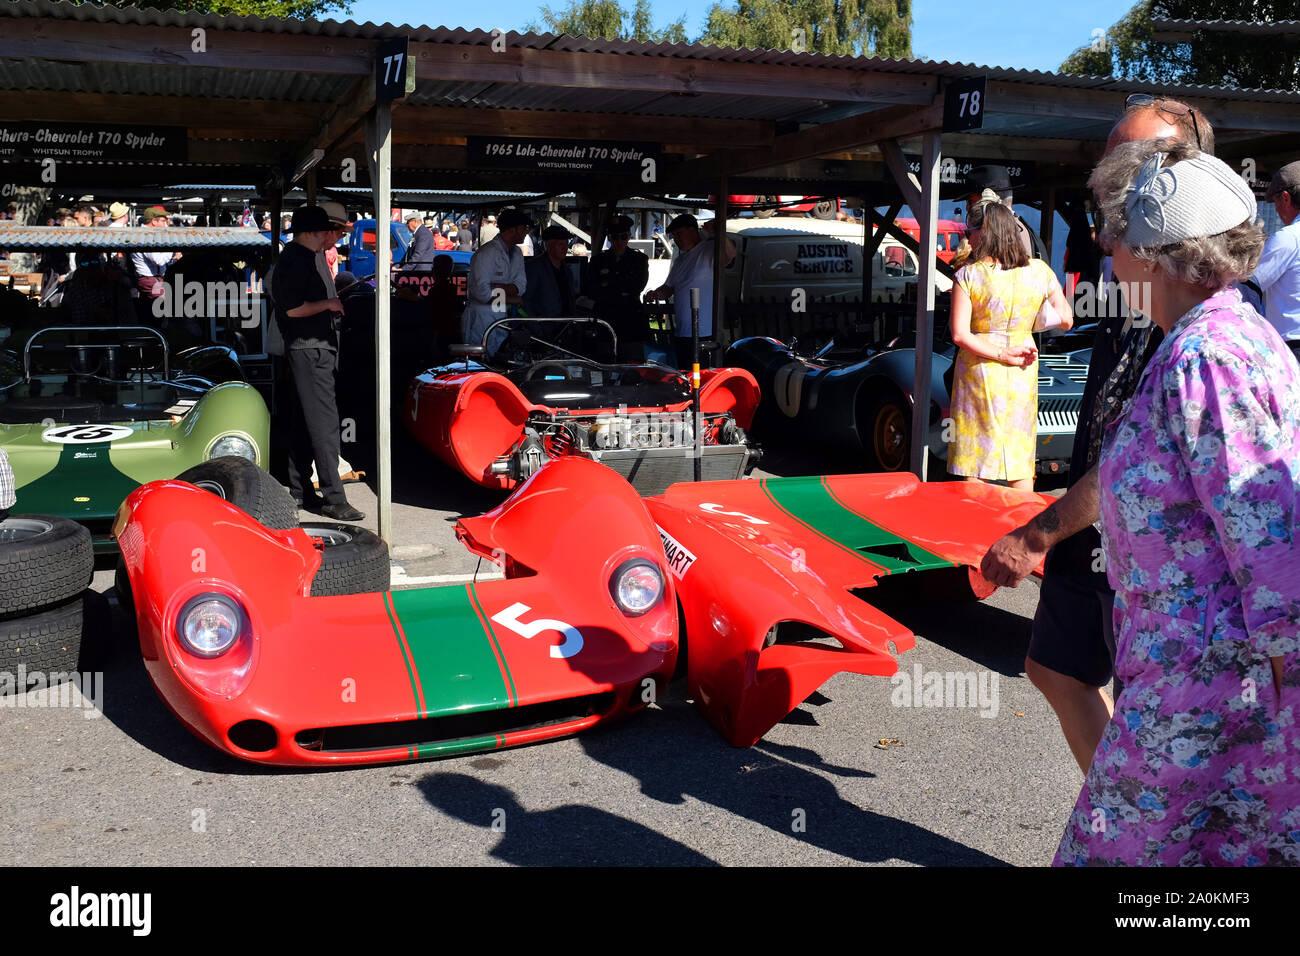 "Septiembre 2019 - Classic Lola Chevrolet race car en el paddock en el encuentro ""Goodwood Revival"" Foto de stock"